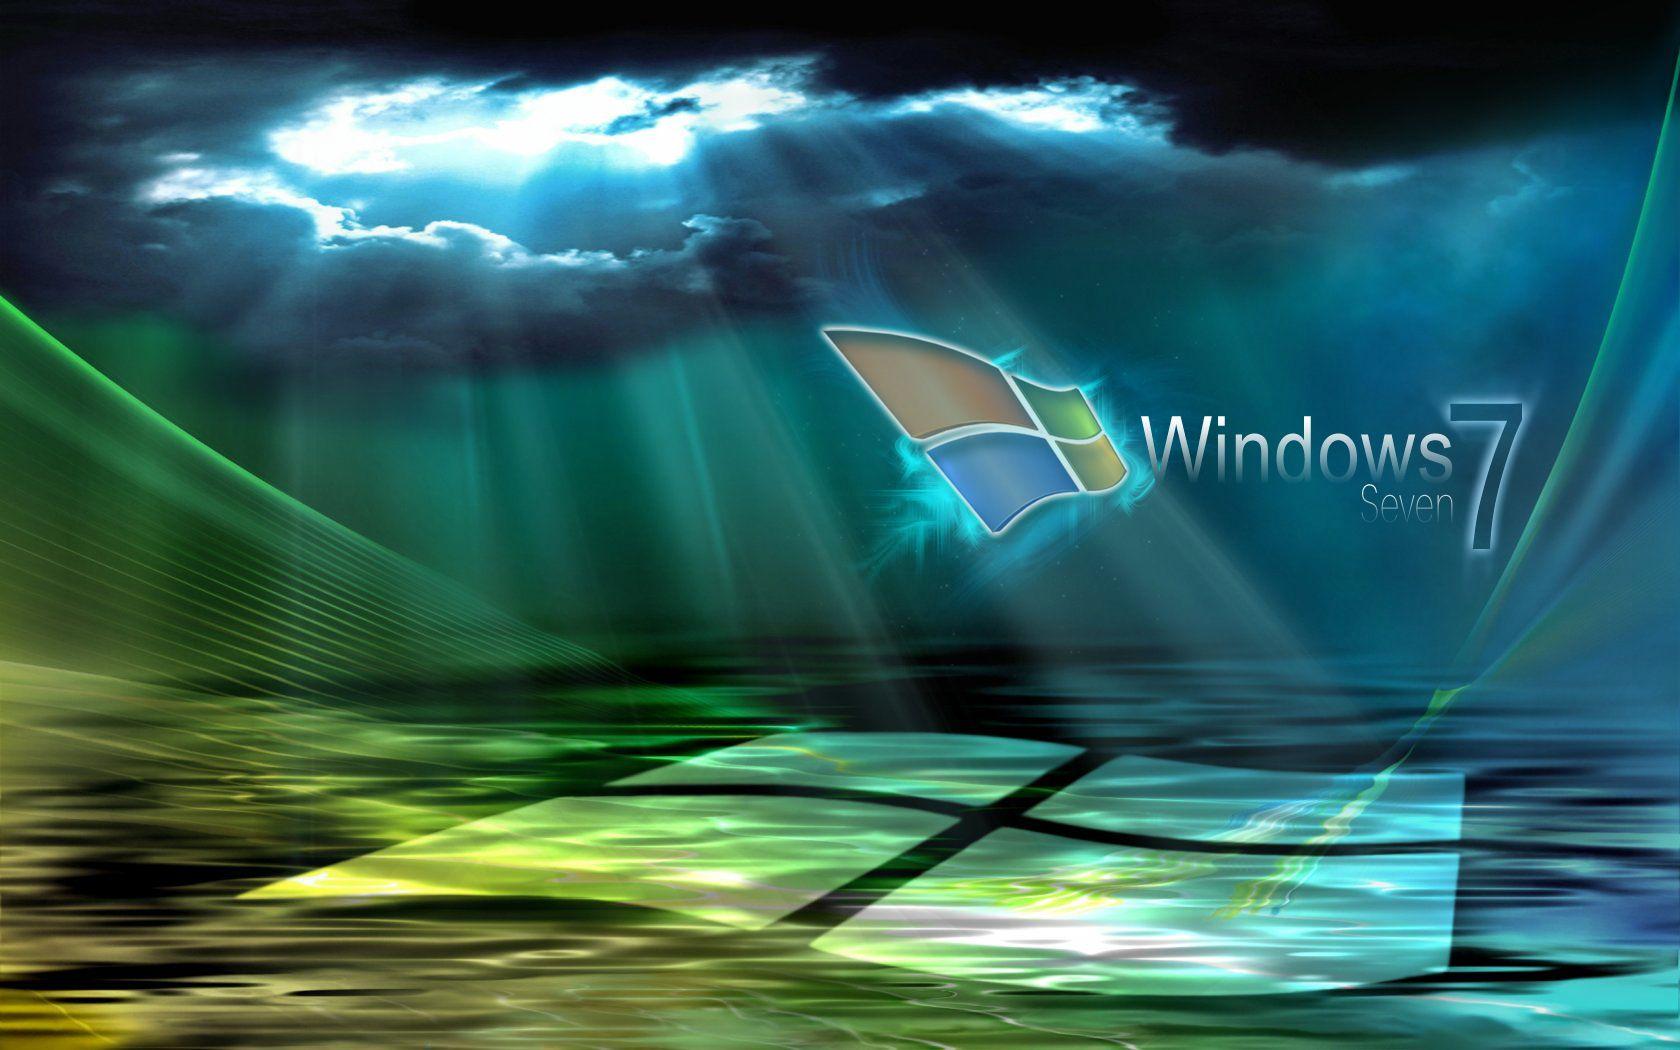 Background image windows 7 location - Current Location